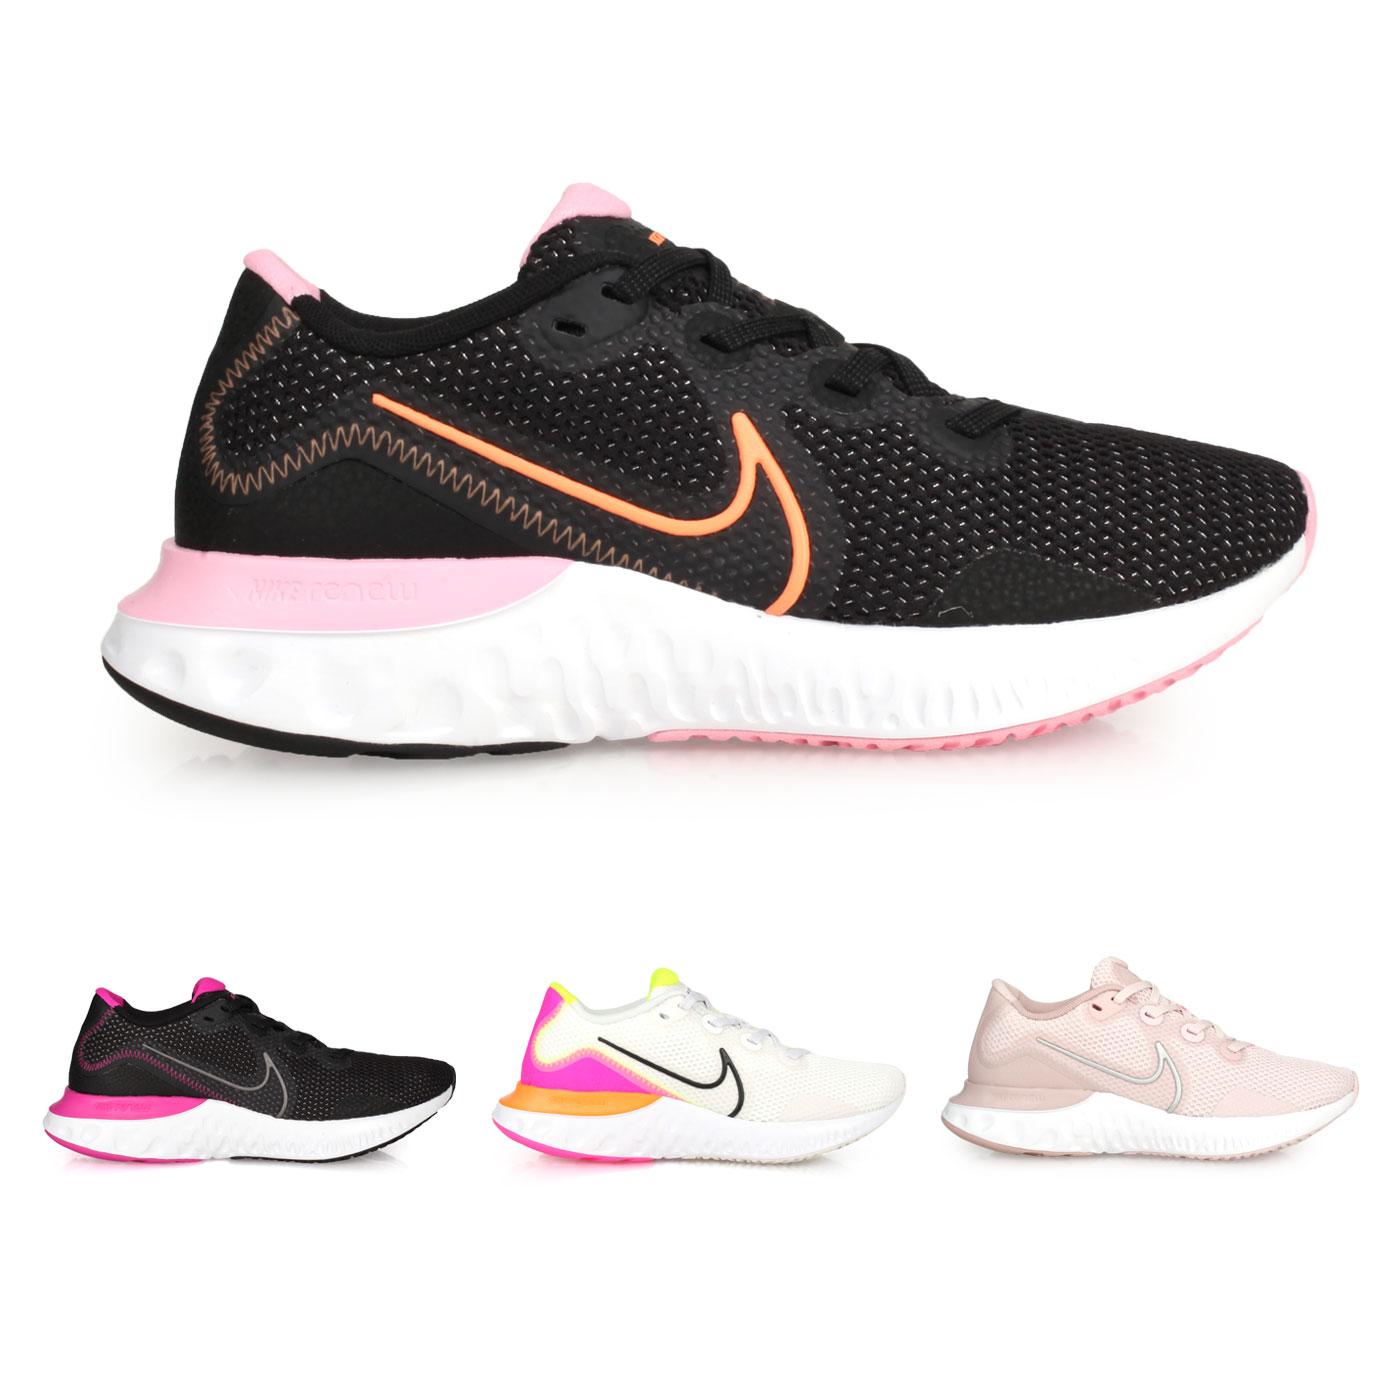 NIKE 女款慢跑鞋  @WMNS RENEW RUN@CK6360001